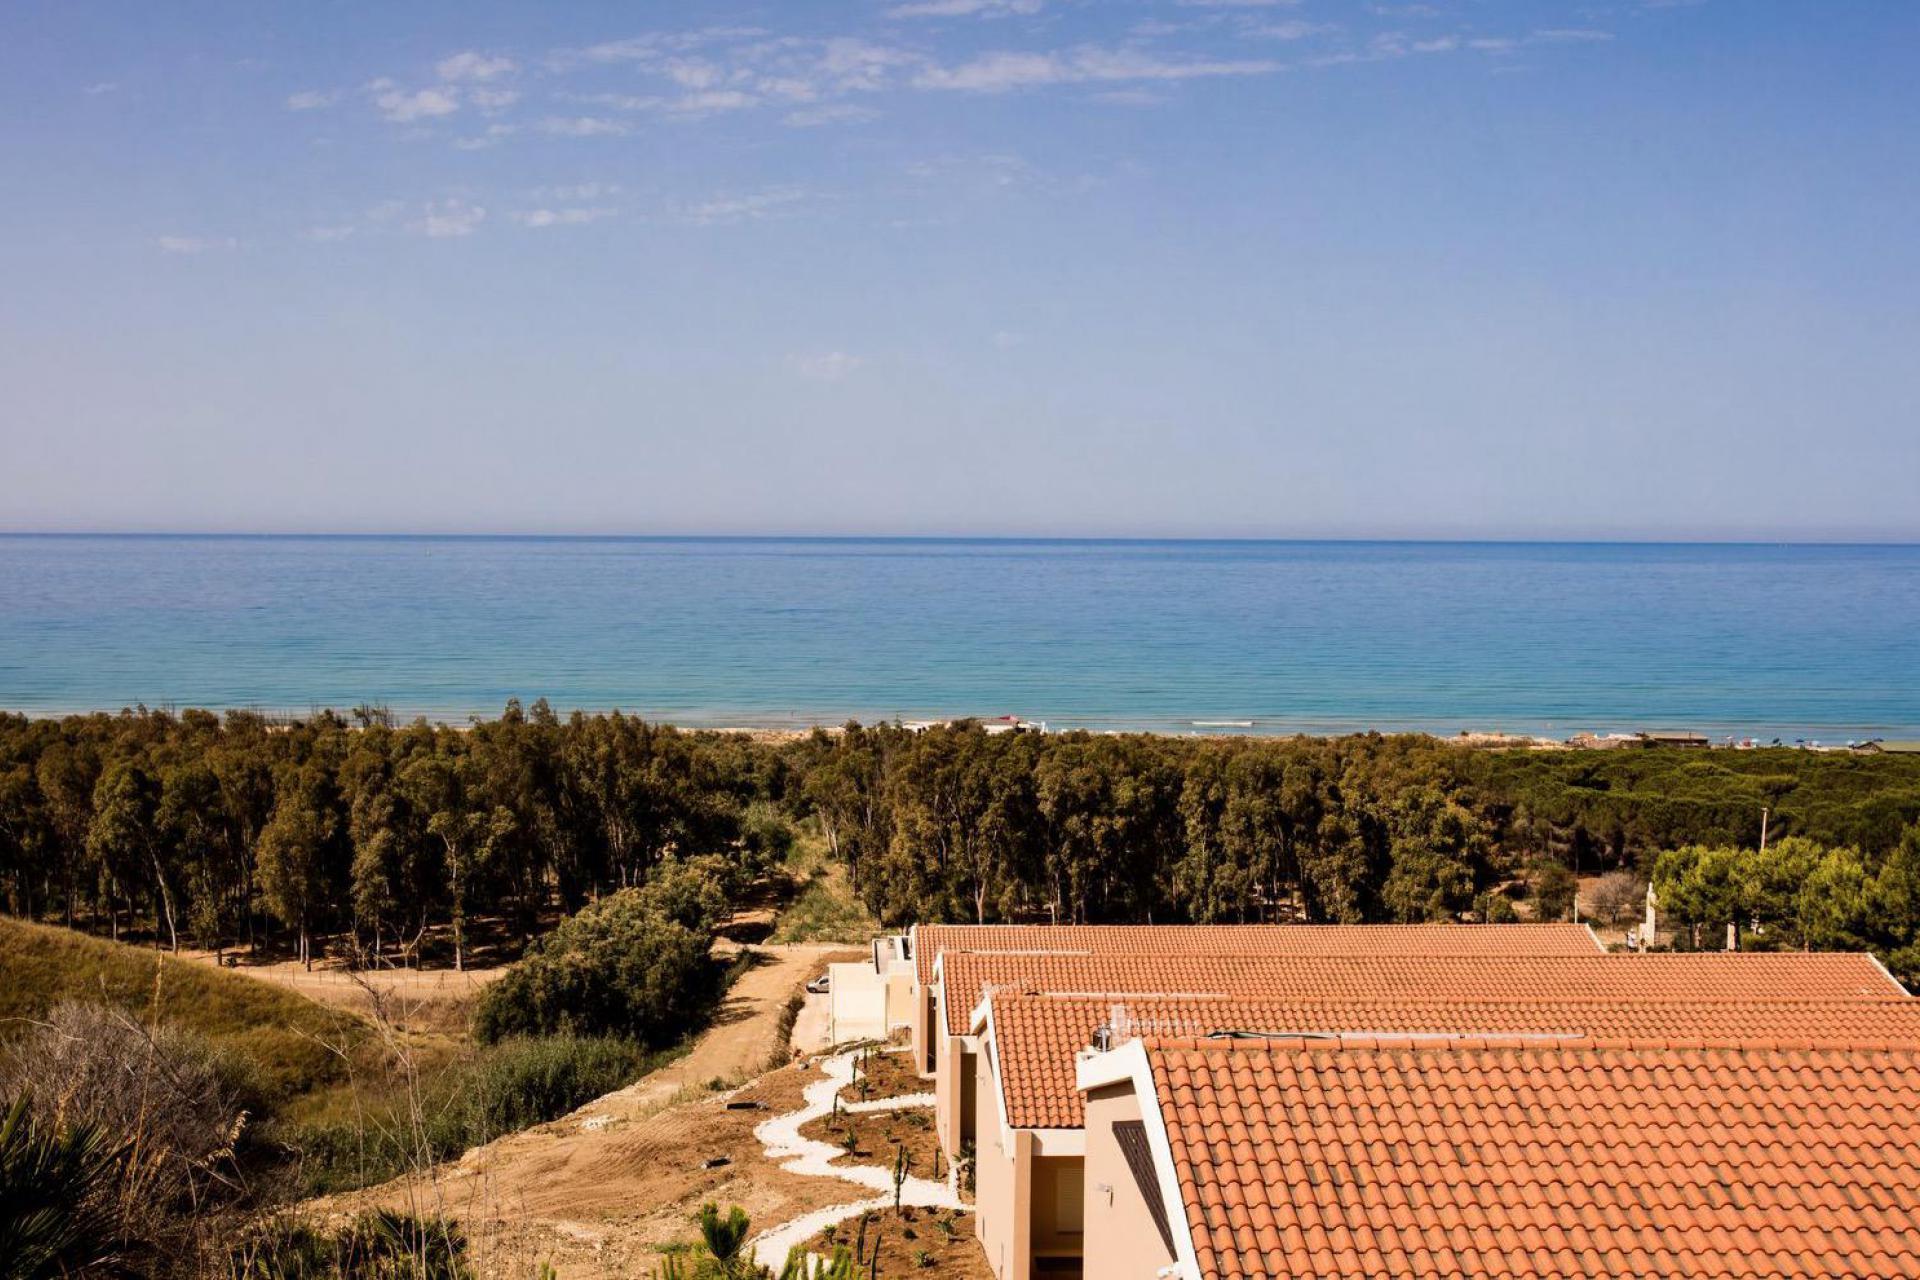 Agriturismo Sicilie Residence op 200 meter lopen van zee